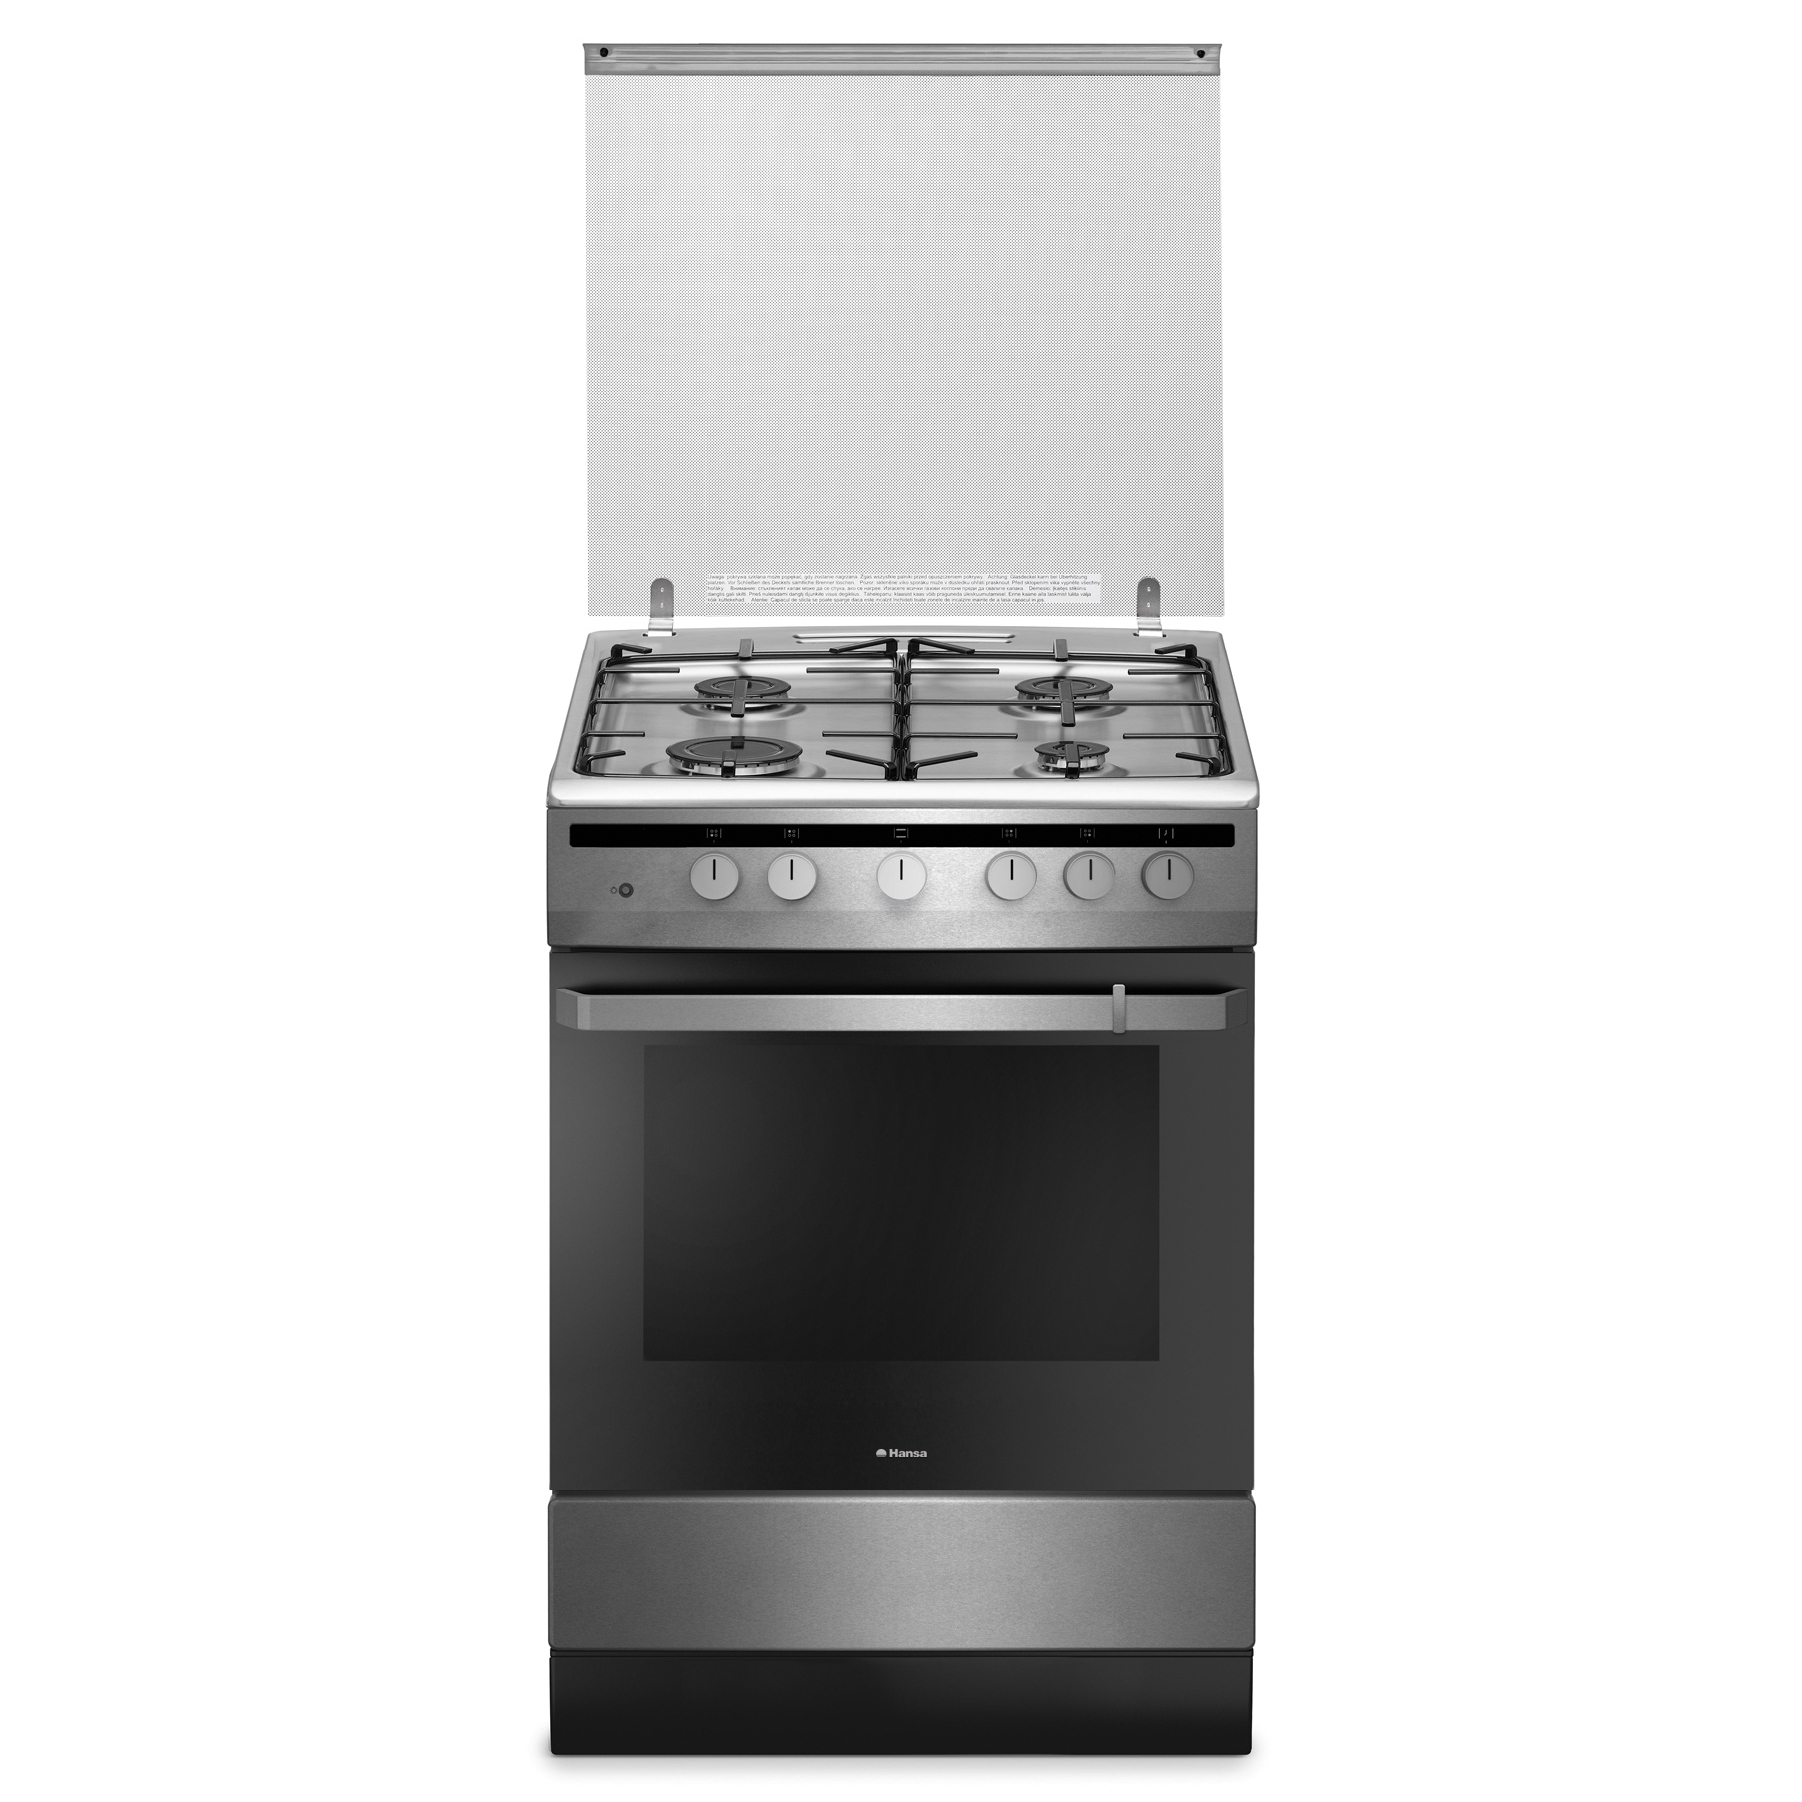 Aragaz Hansa FCGX61109 4 arzatoare, Grill, Rotisor, 60cm, inox